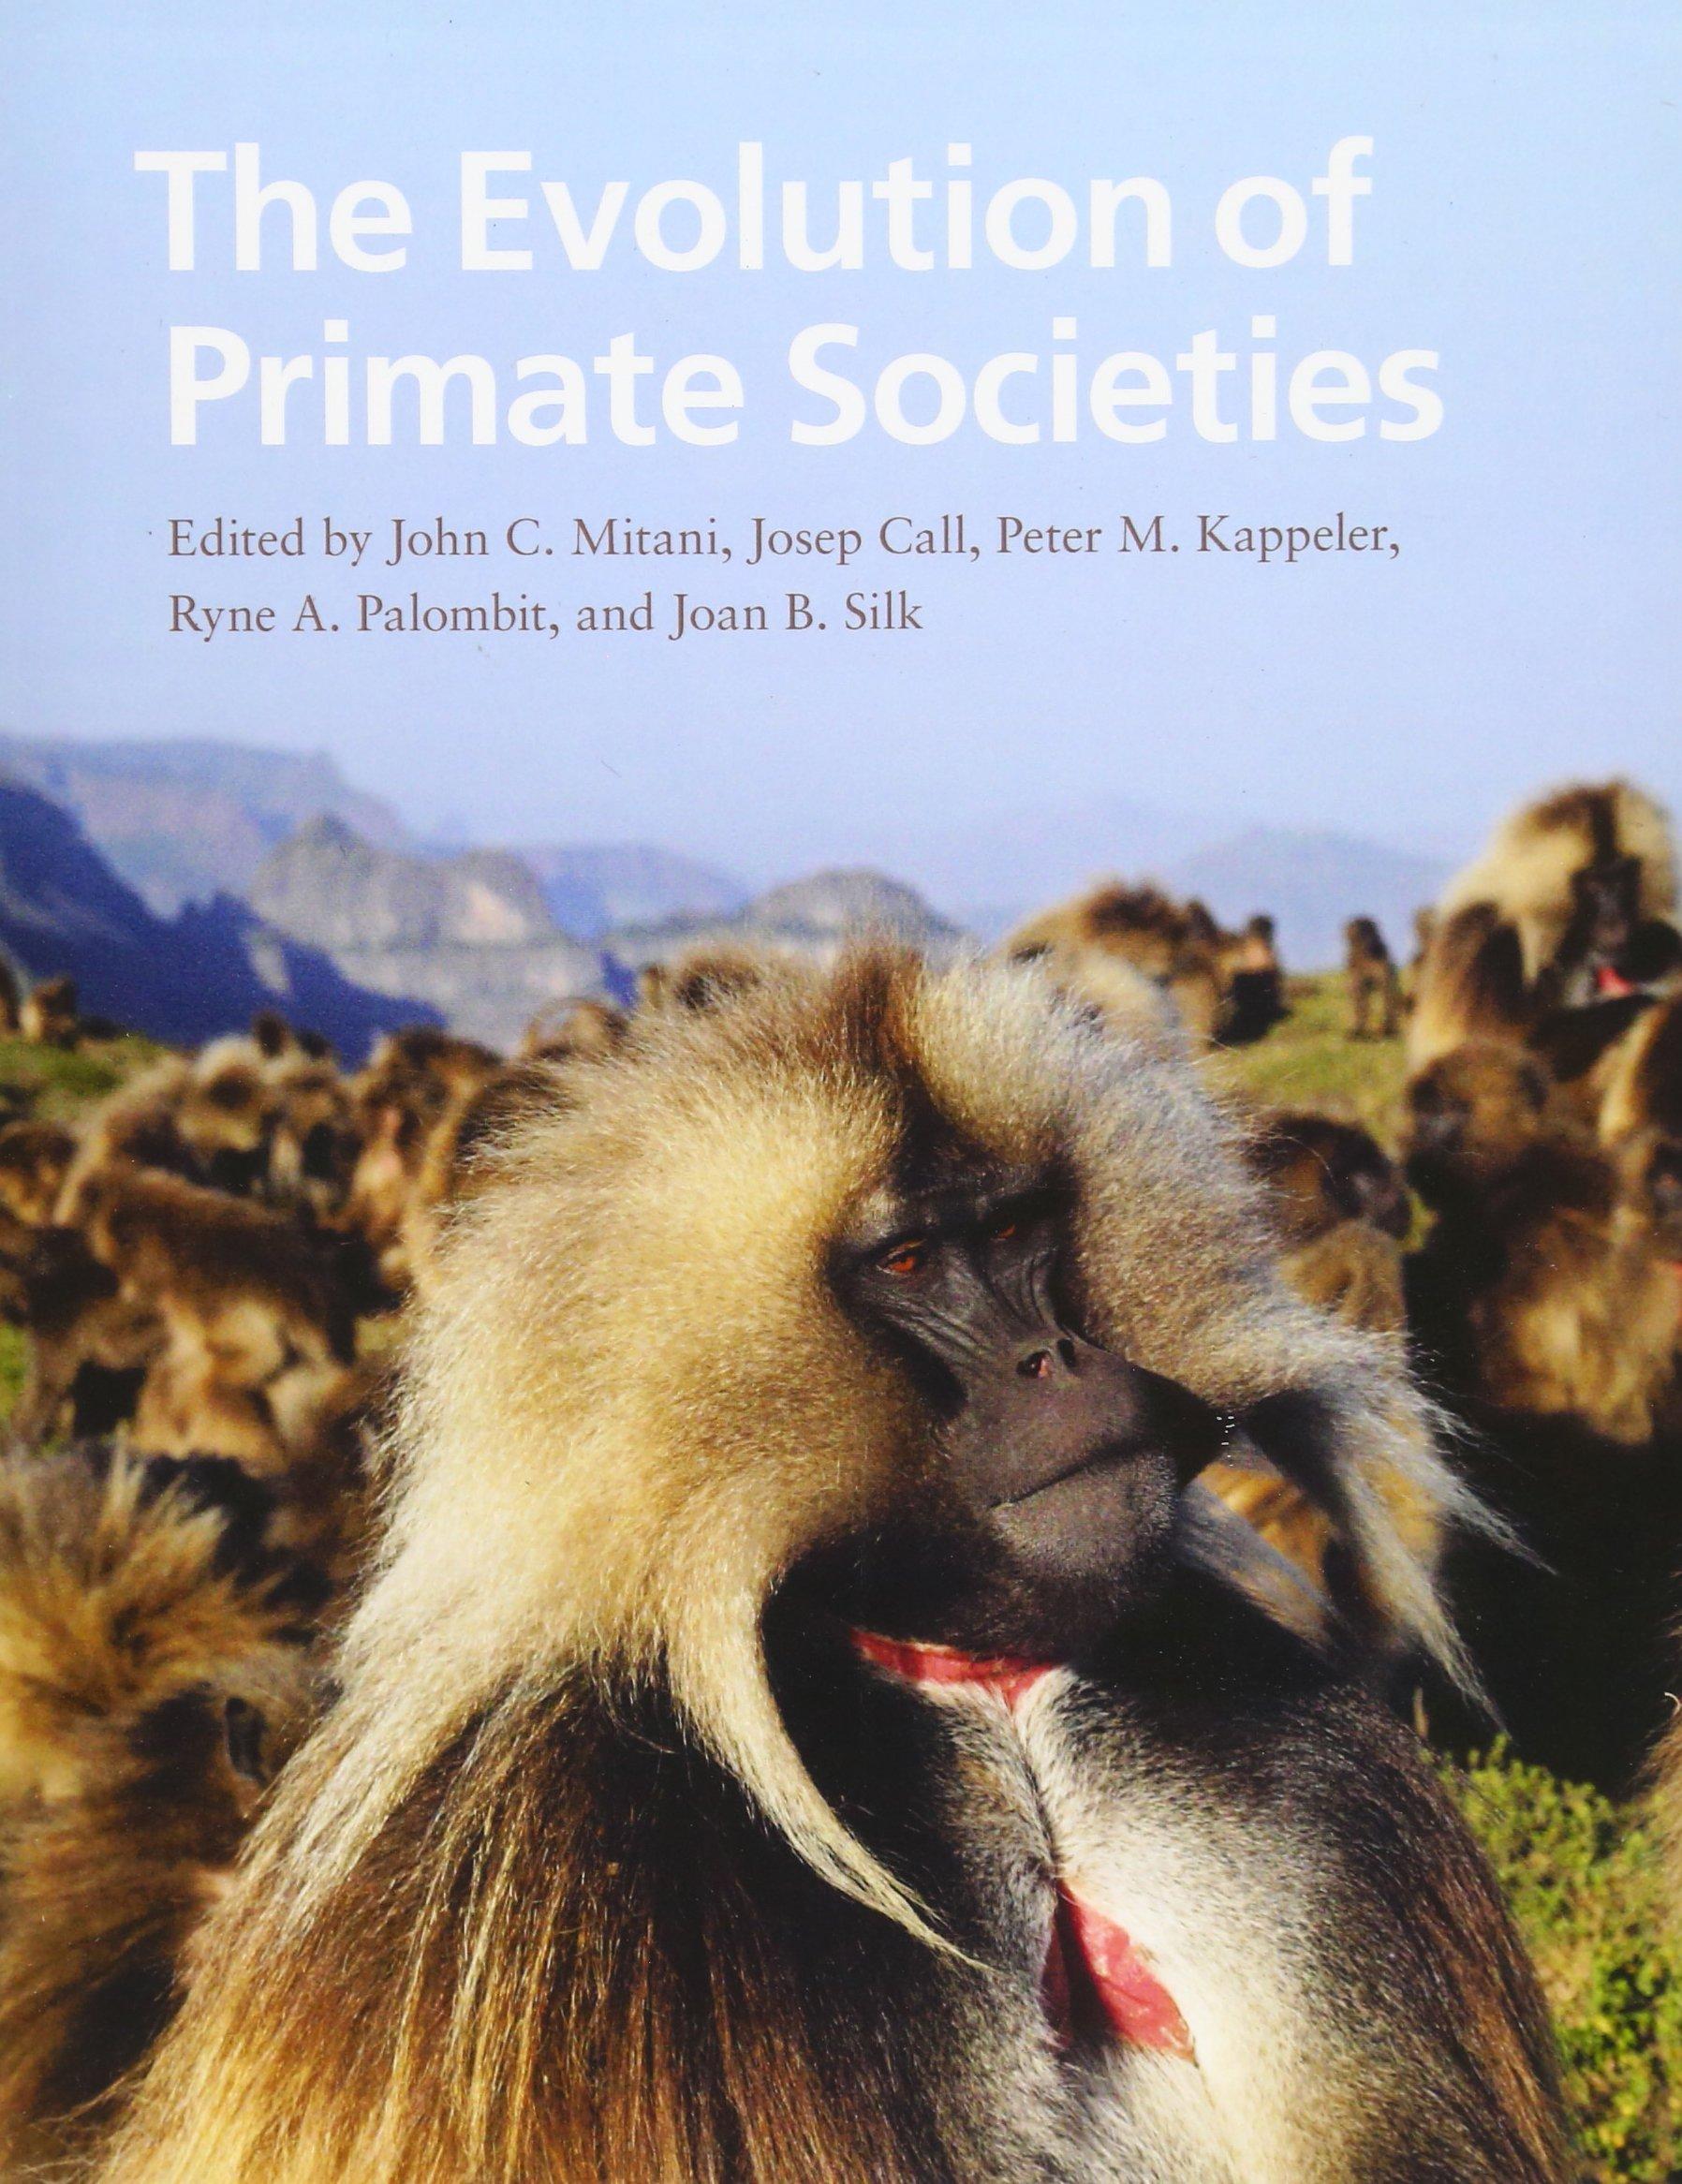 Download The Evolution of Primate Societies ebook